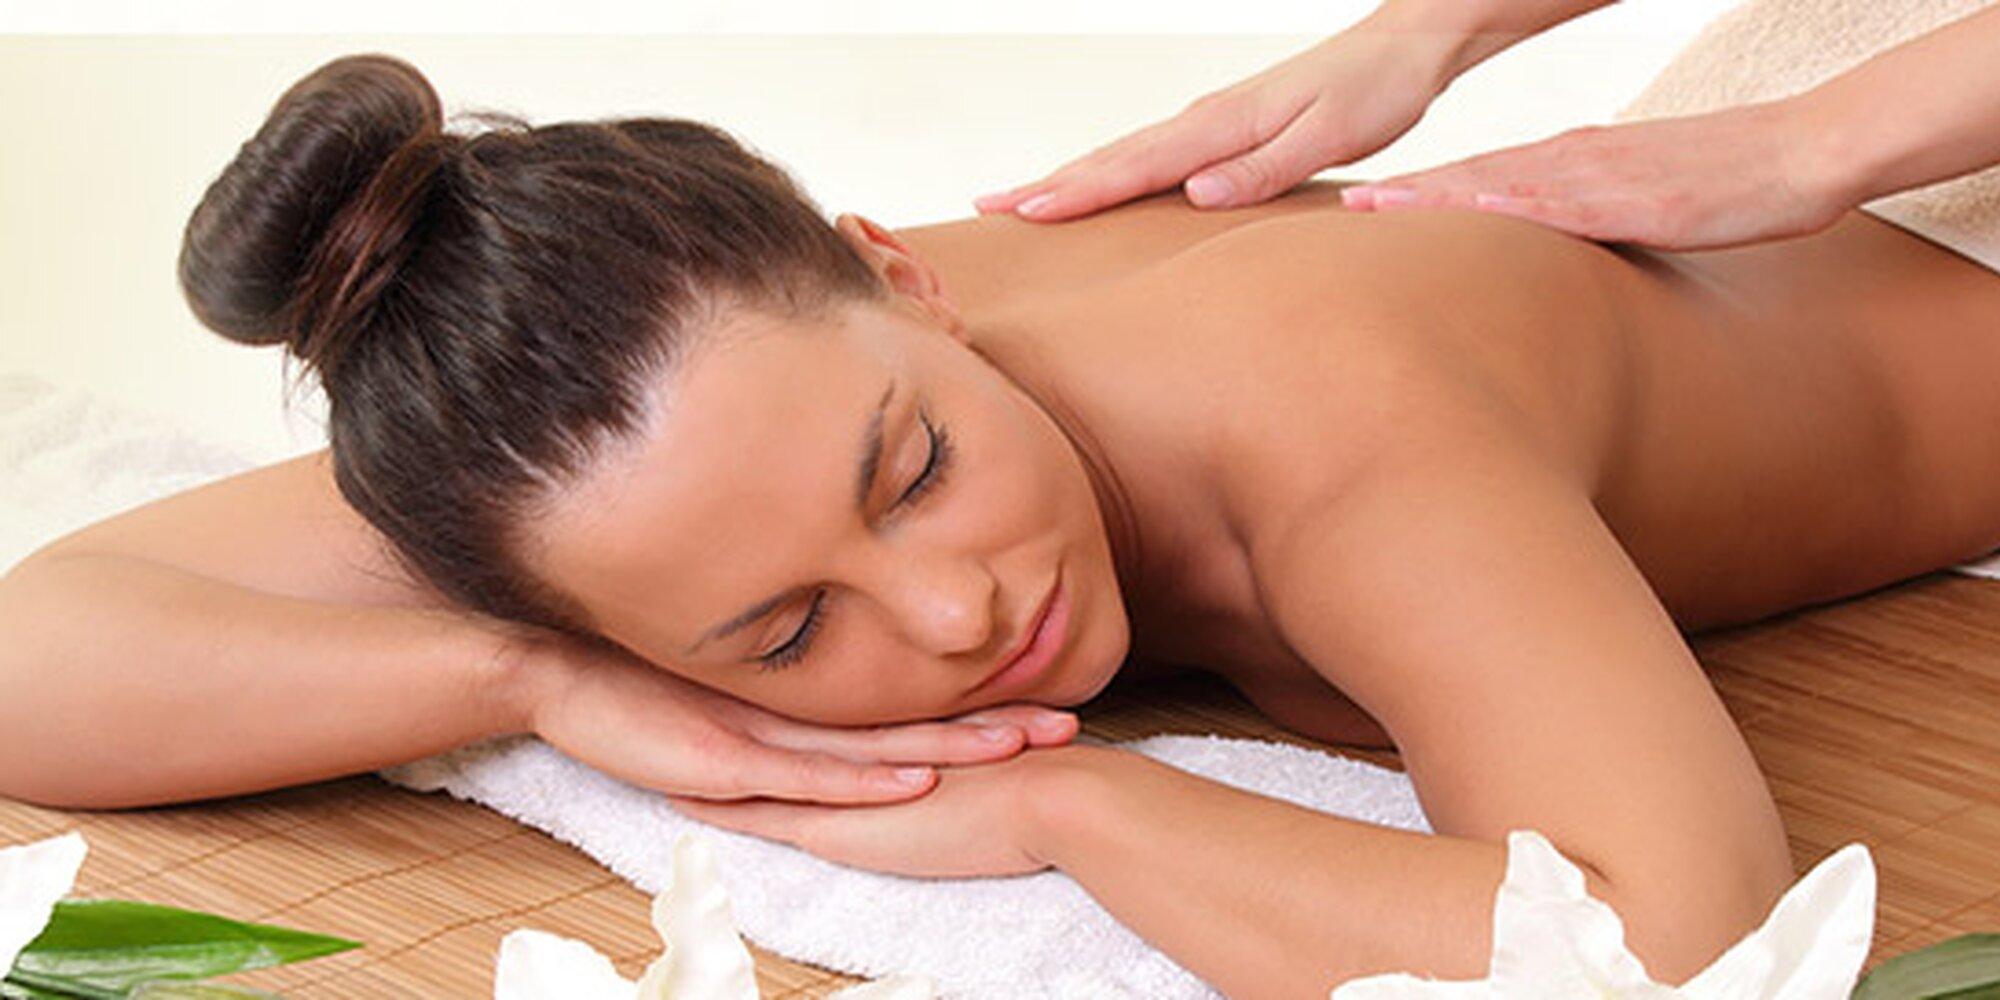 erotic massage map bøsse chat sites